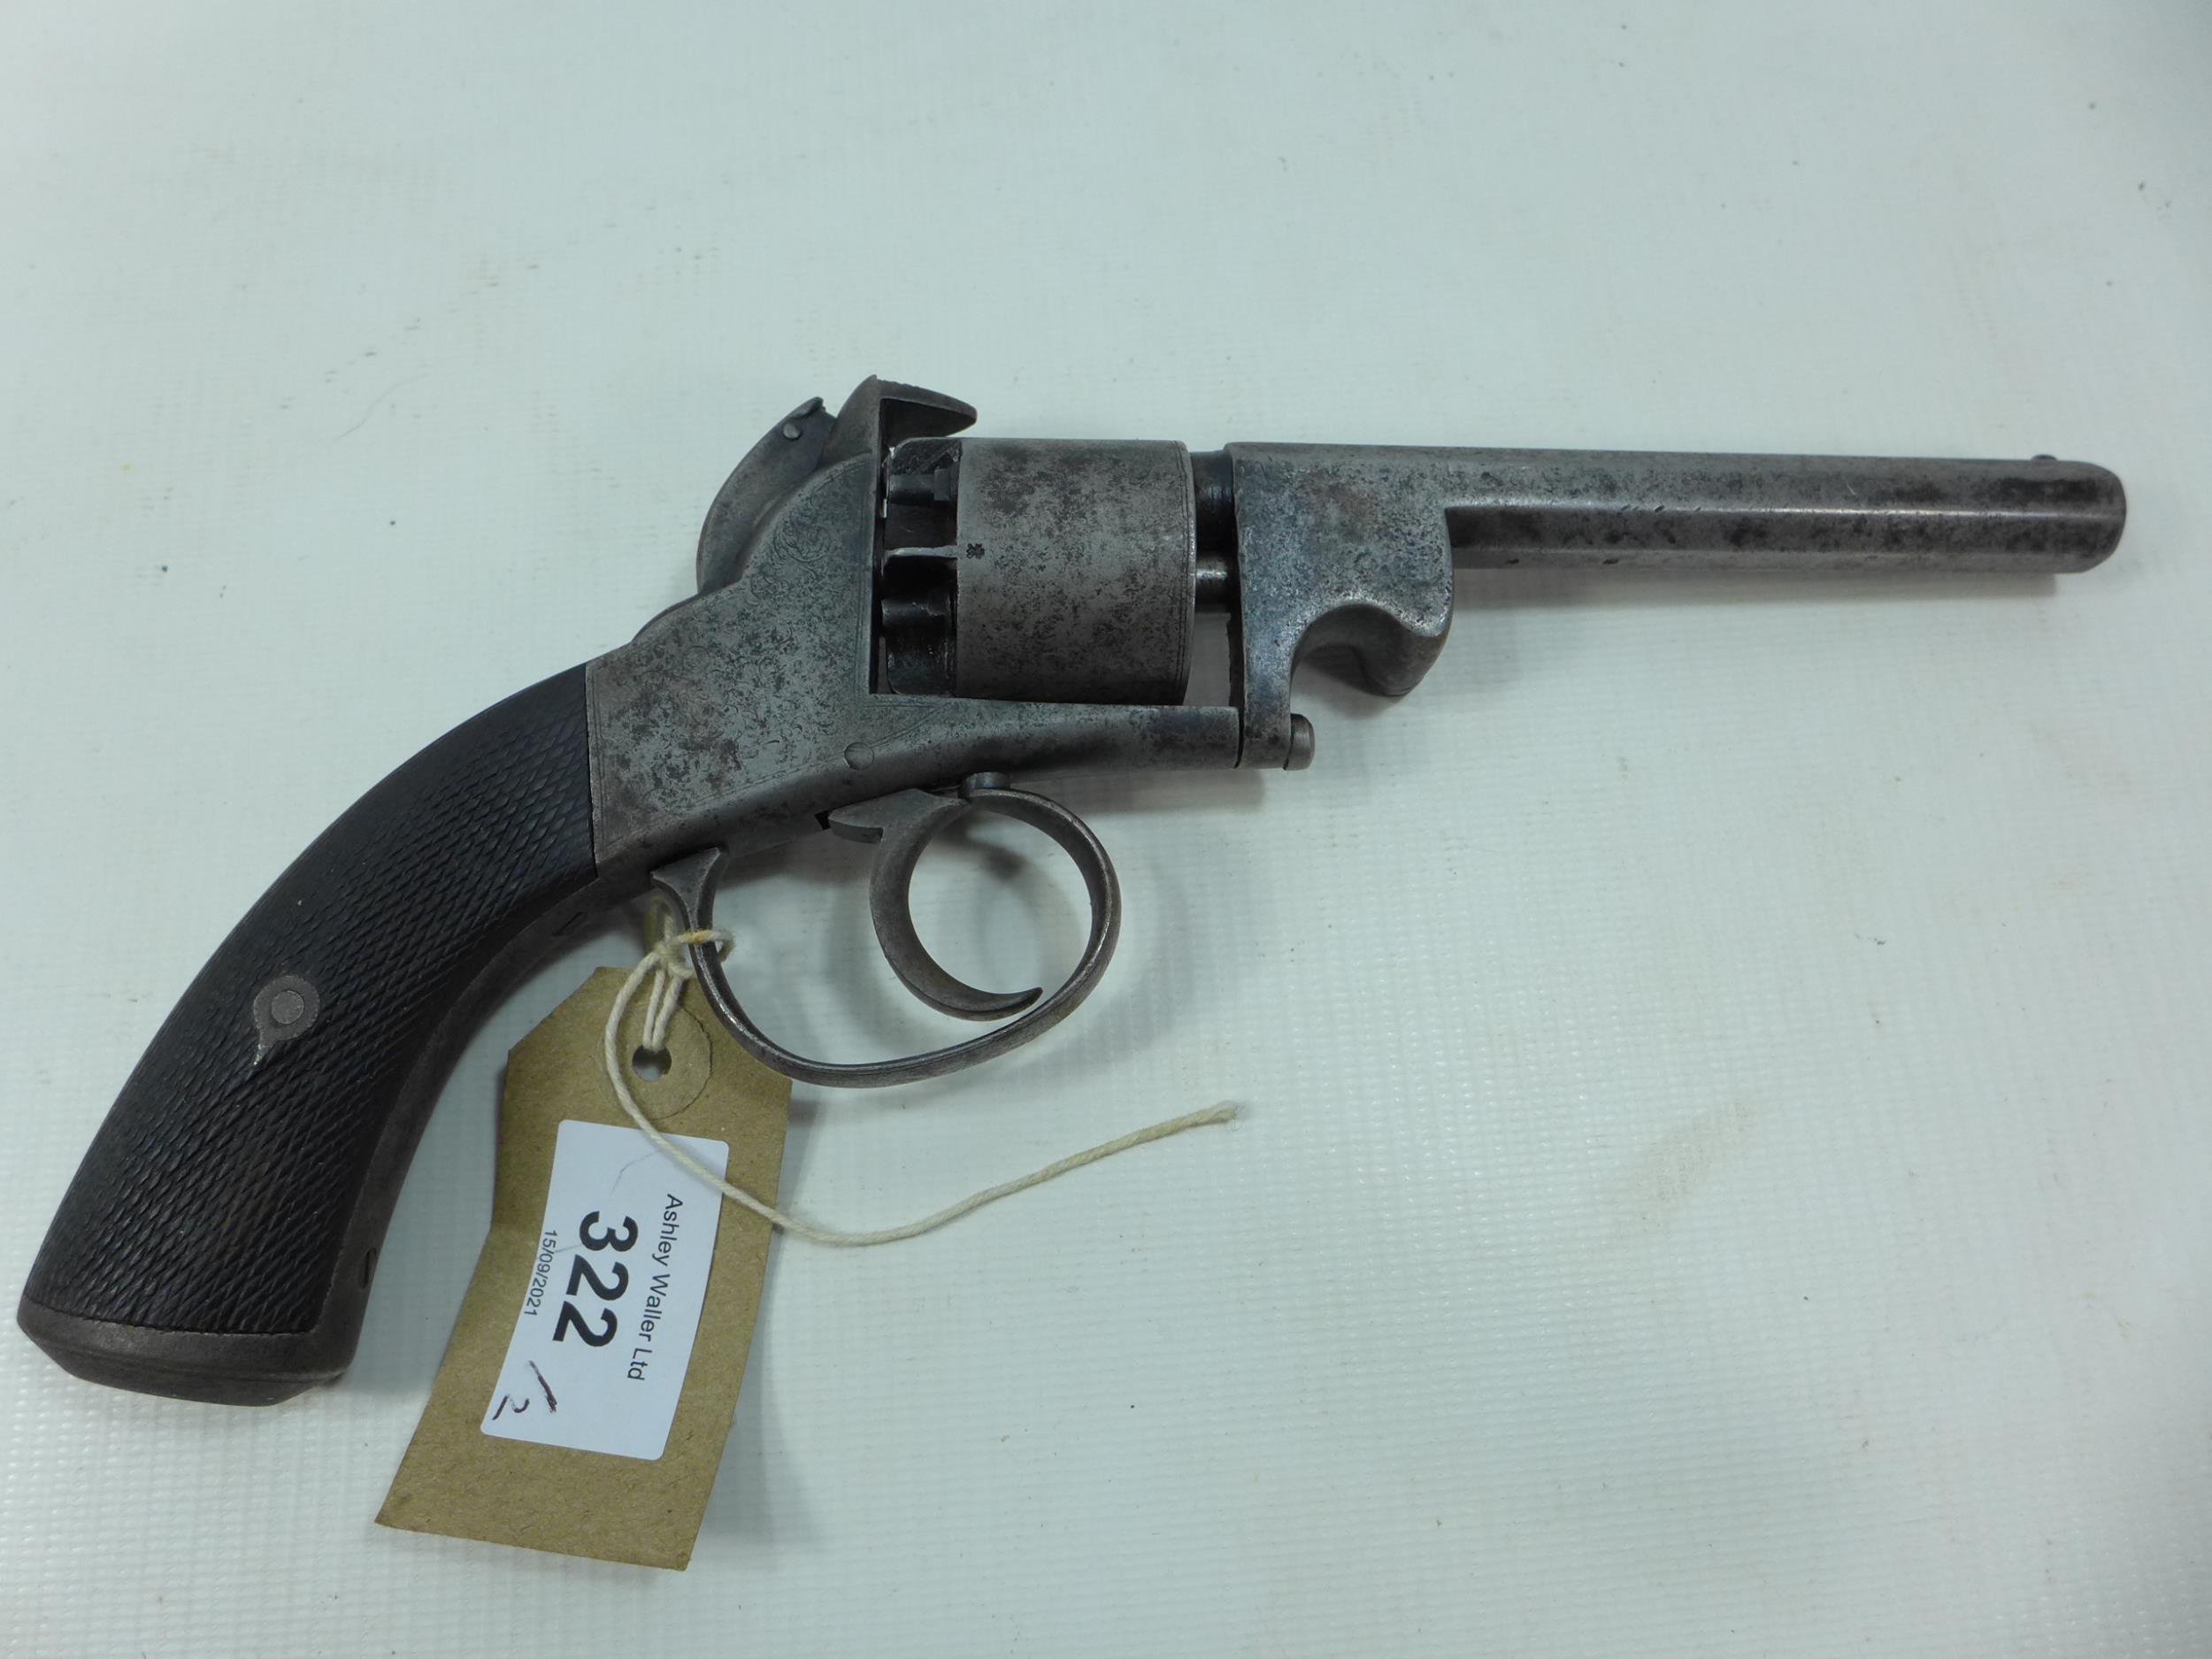 A 19TH CENTURY WEBLEY BENTLEY FIVE SHOT DOUBLE ACTION PERCUSION CAP SPURLESS REVOLVER, 13CM - Image 2 of 8